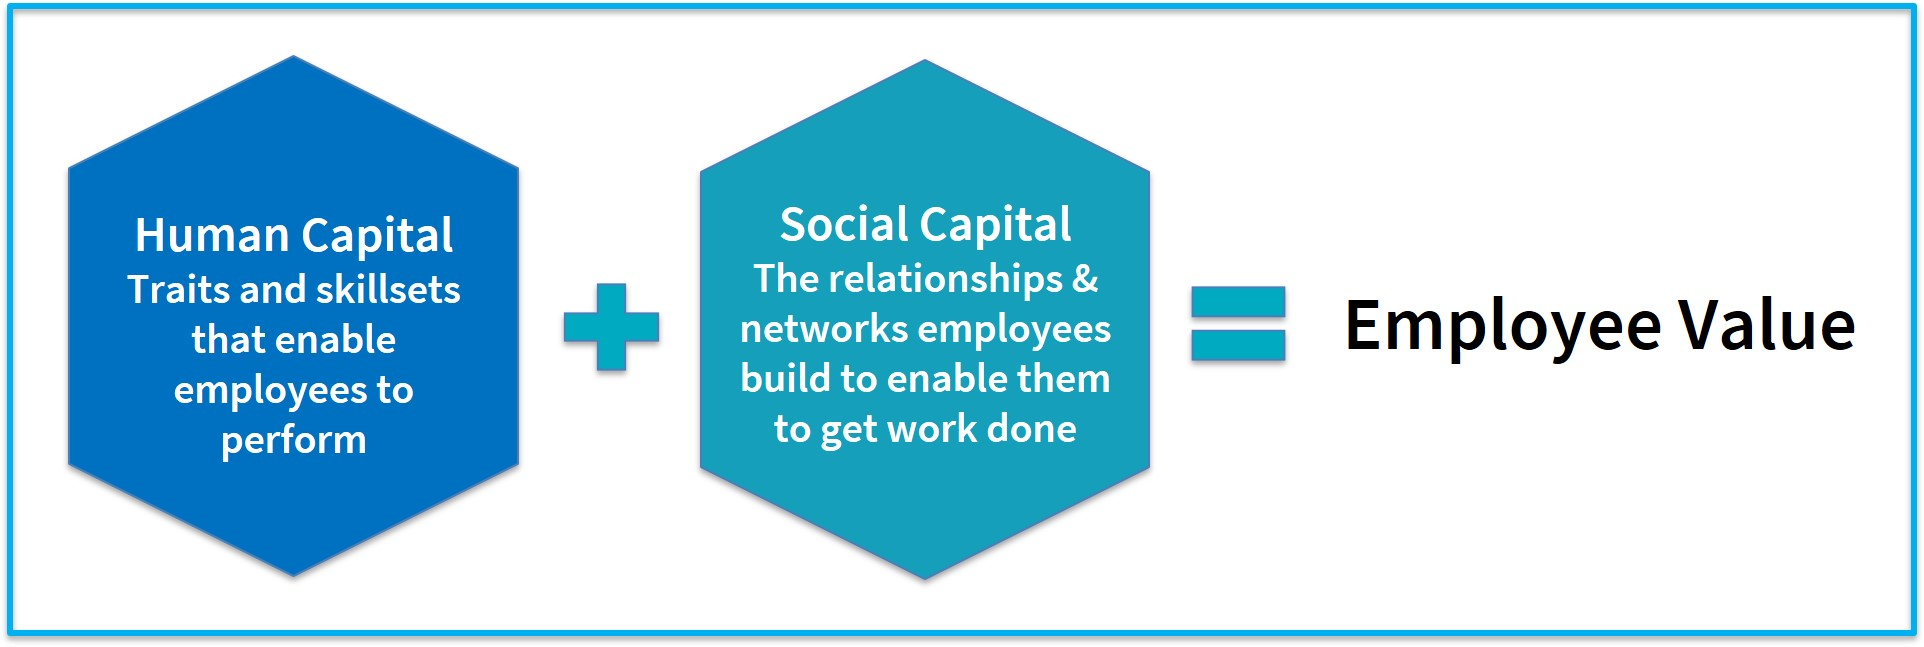 Human Capital + Social Capital = Employee Value